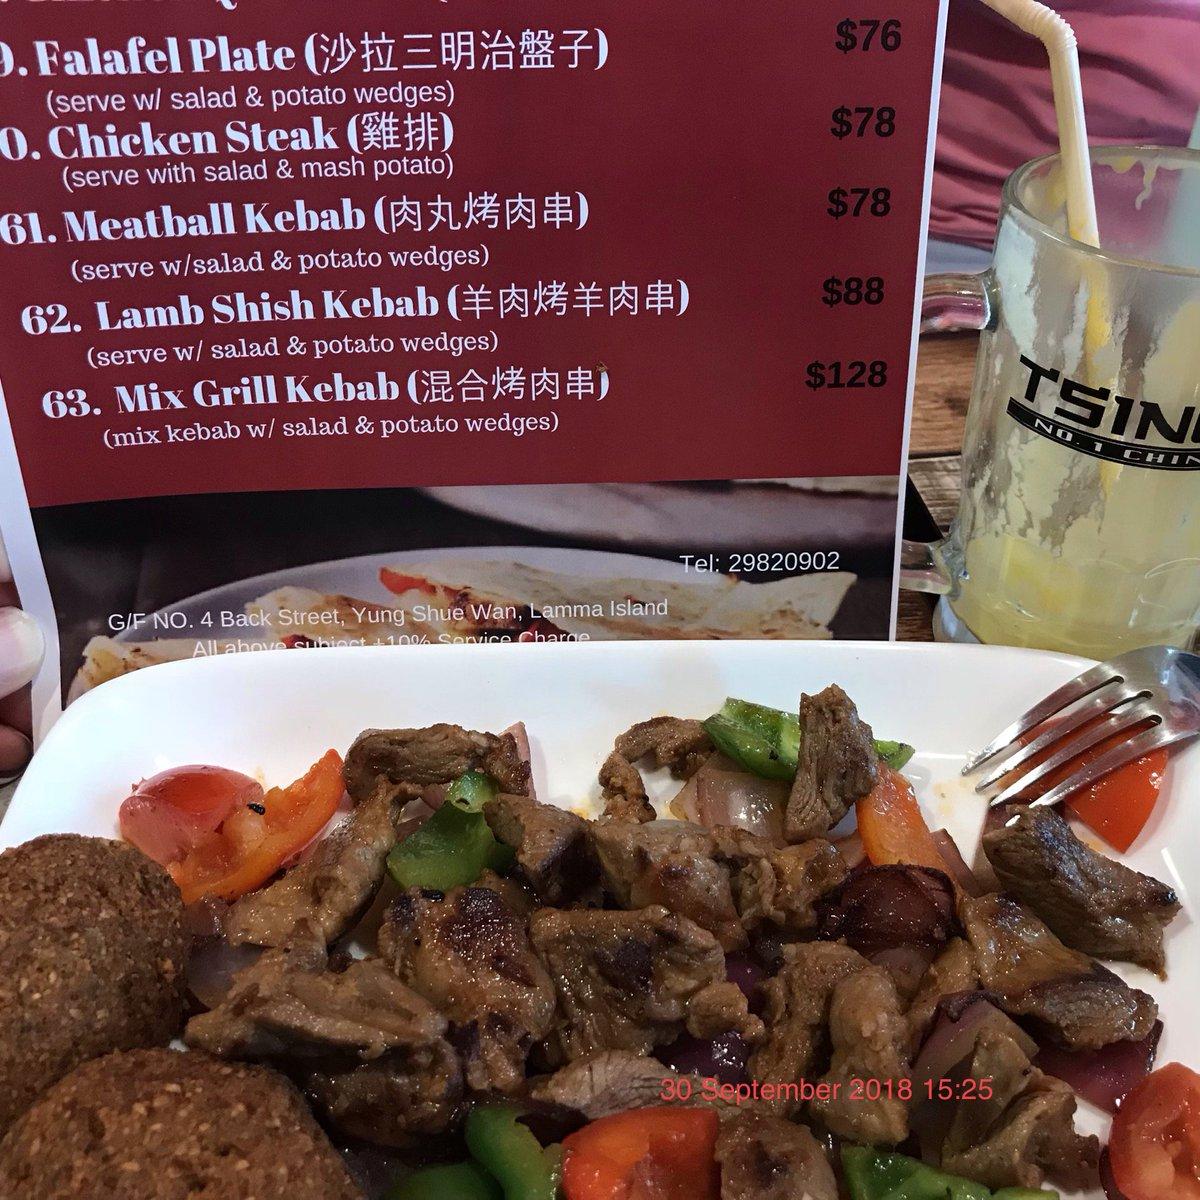 Lamb kebab on Lamma island